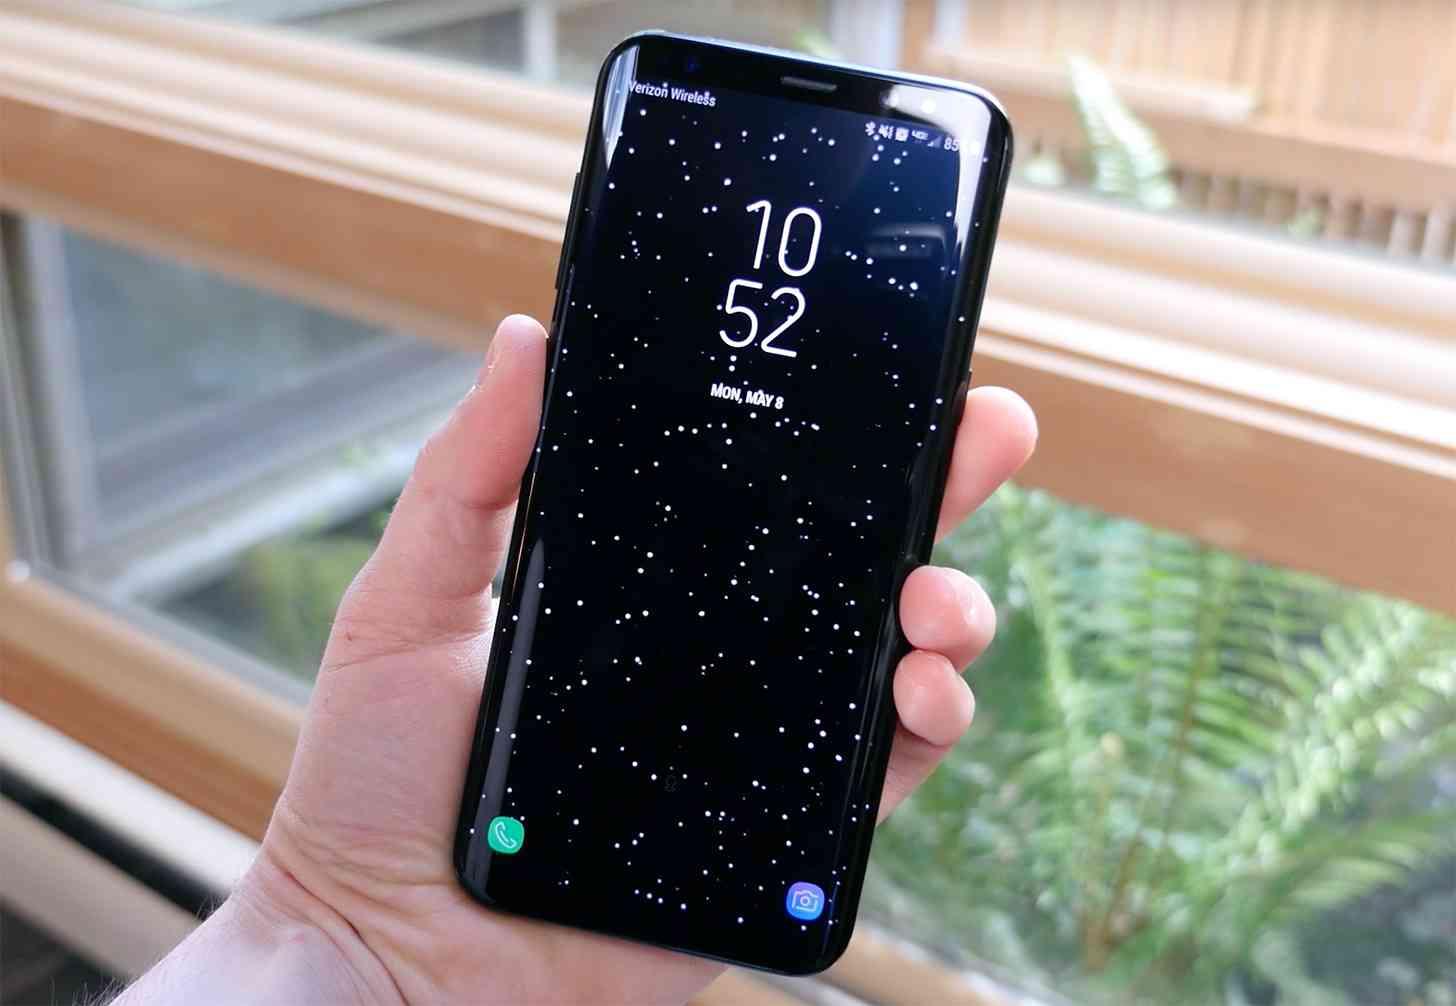 Samsung Galaxy S8 lock screen